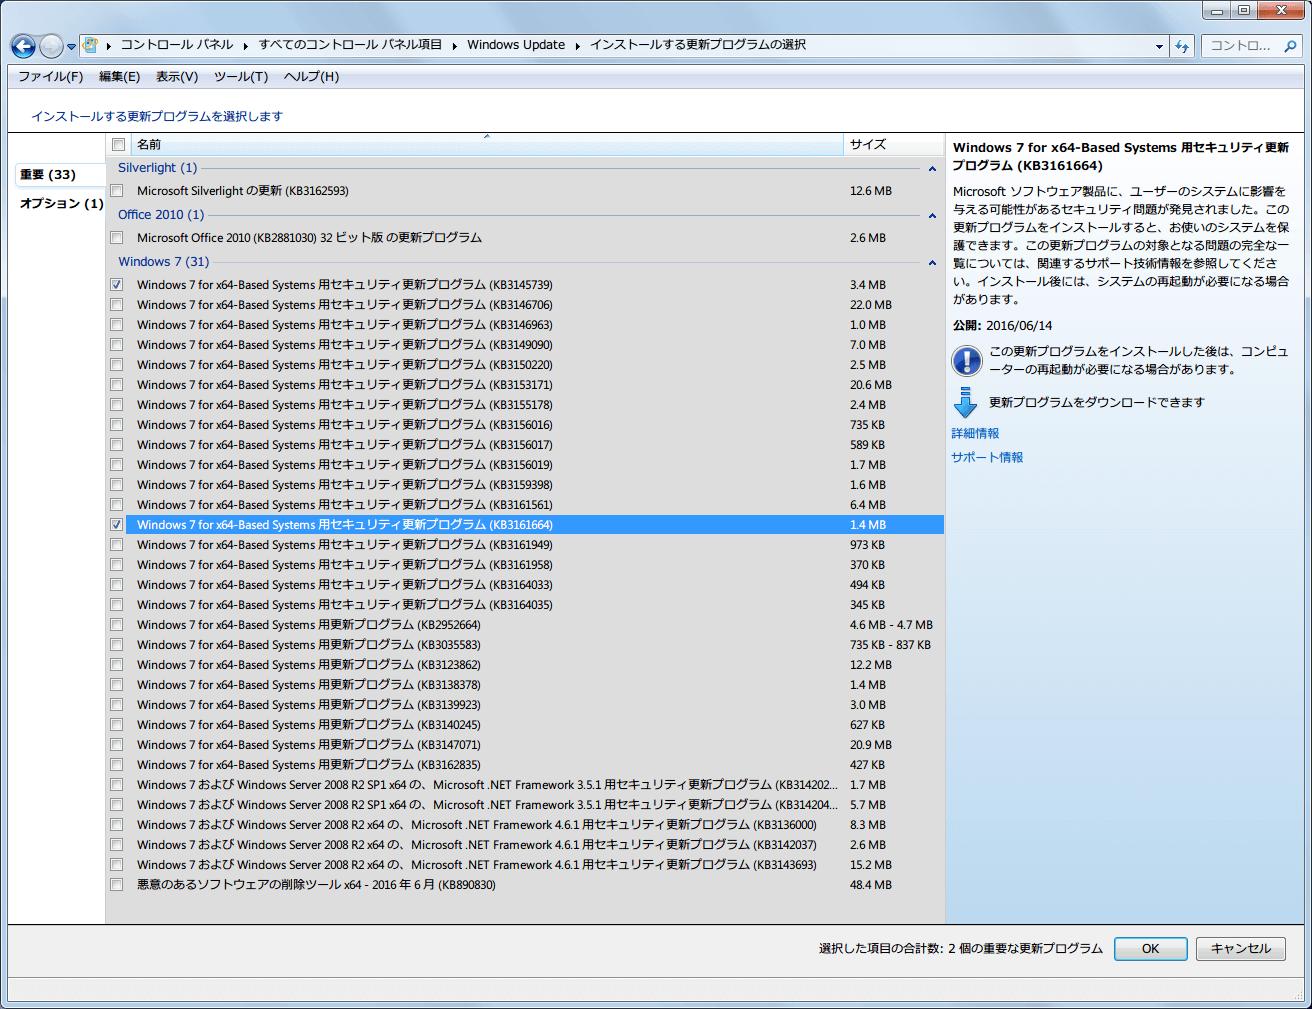 Windows 7 for x64-Based Systems 用セキュリティ更新プログラム KB3161664 公開:2016/06/14 Windows Update チェック時間短縮のため先にインストール